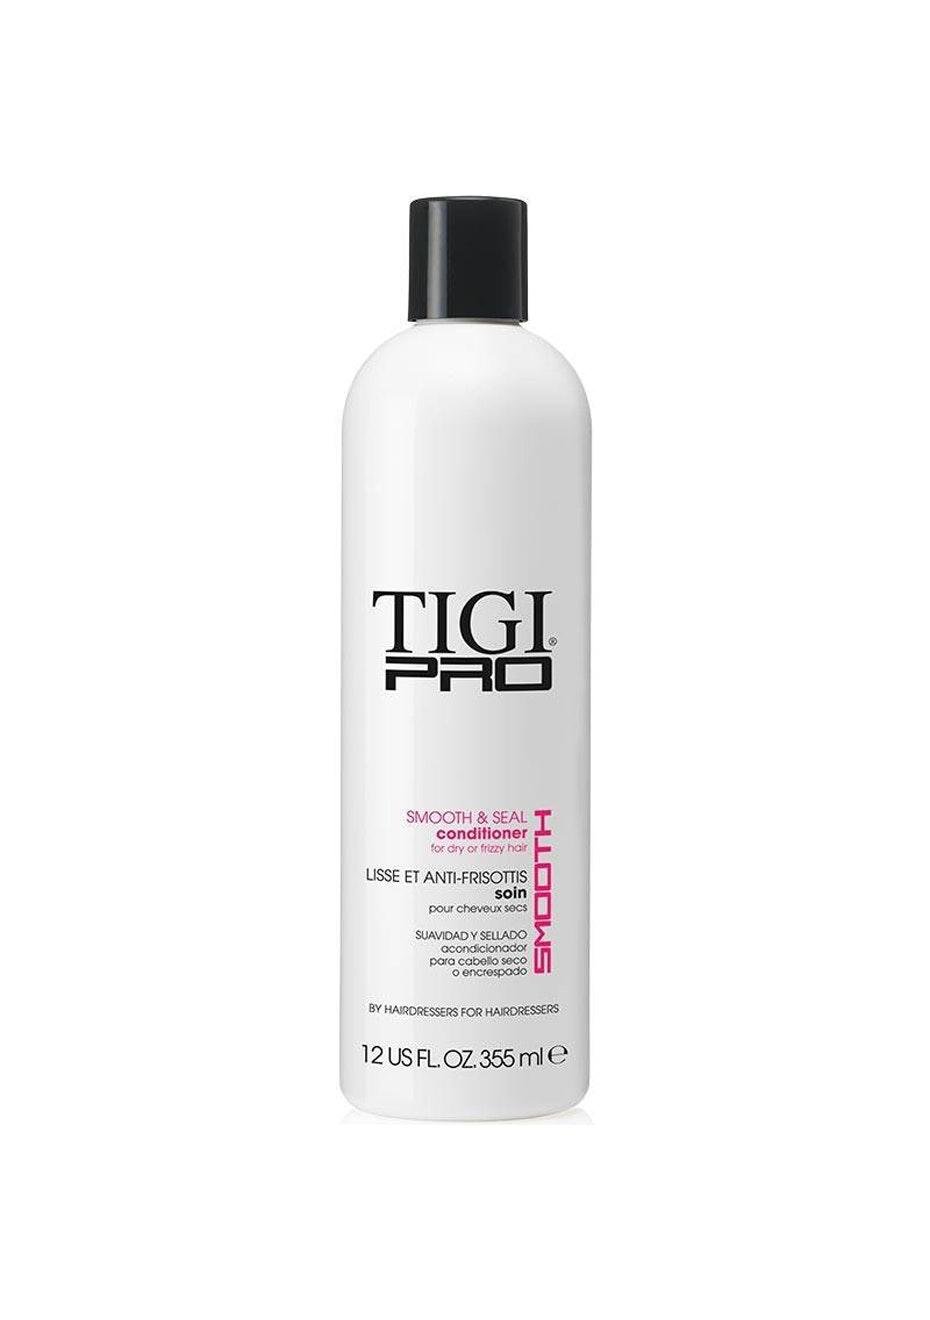 Tigi Pro Smooth & Seal Moisture Conditioner 750ml